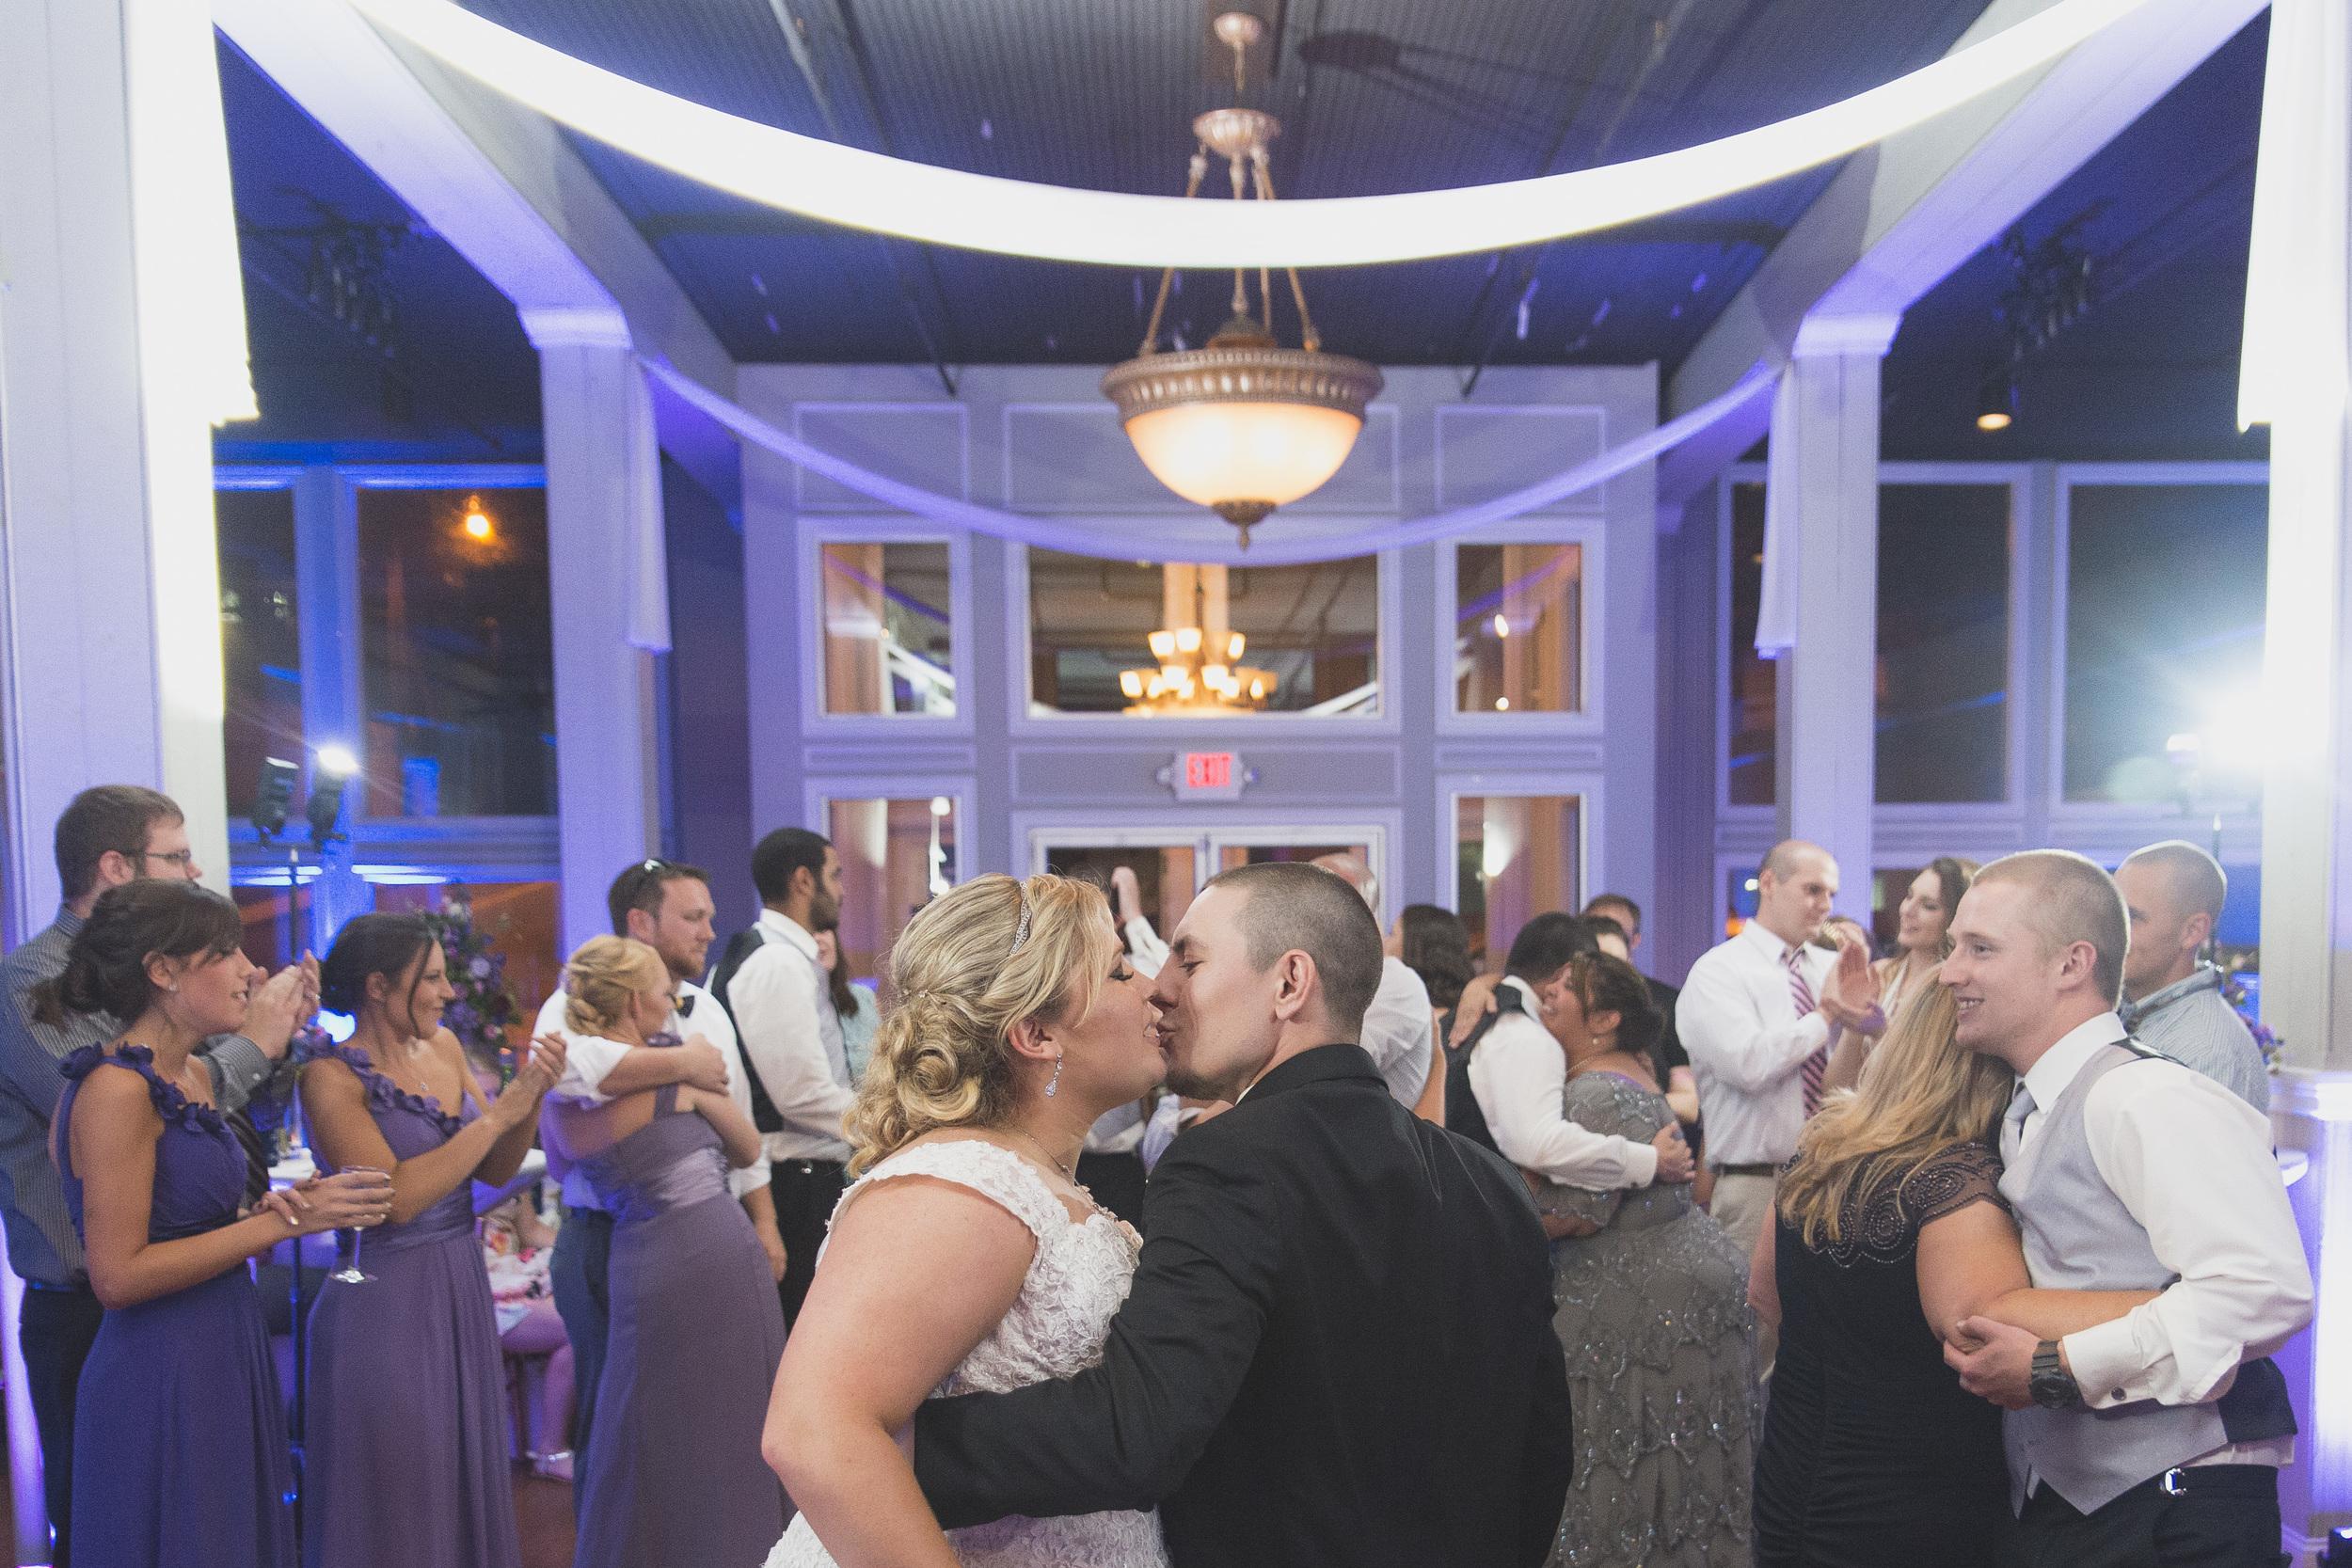 Lynchburg_VA_Wedding_Tresca on 8th_Downtown_Purple_elegant_Photos932.jpg